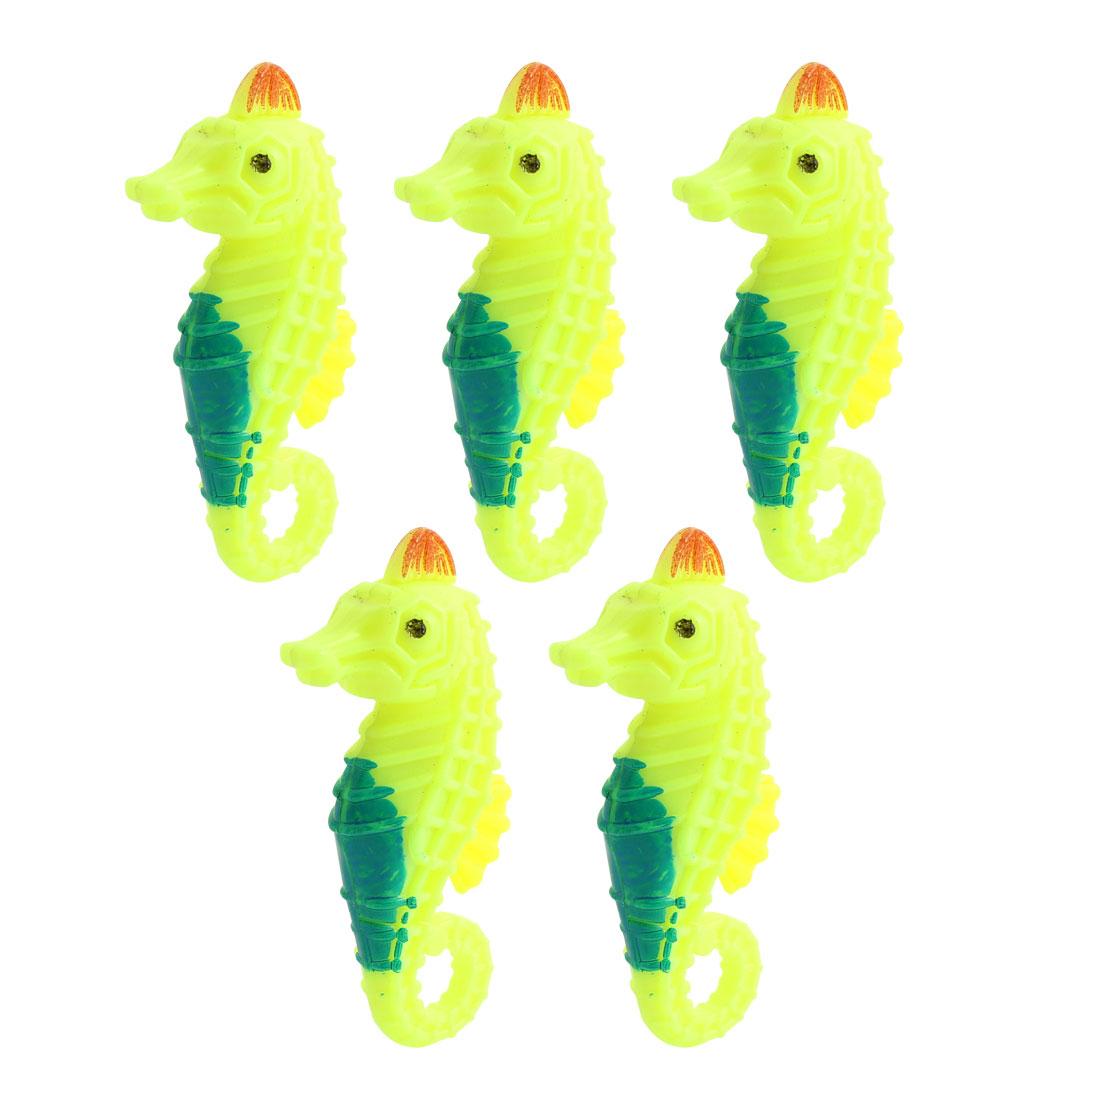 5pcs Green Yellow Emulational Floating Aquatic Seahorse Sea Creature Decor for Aquarium Fish Tank